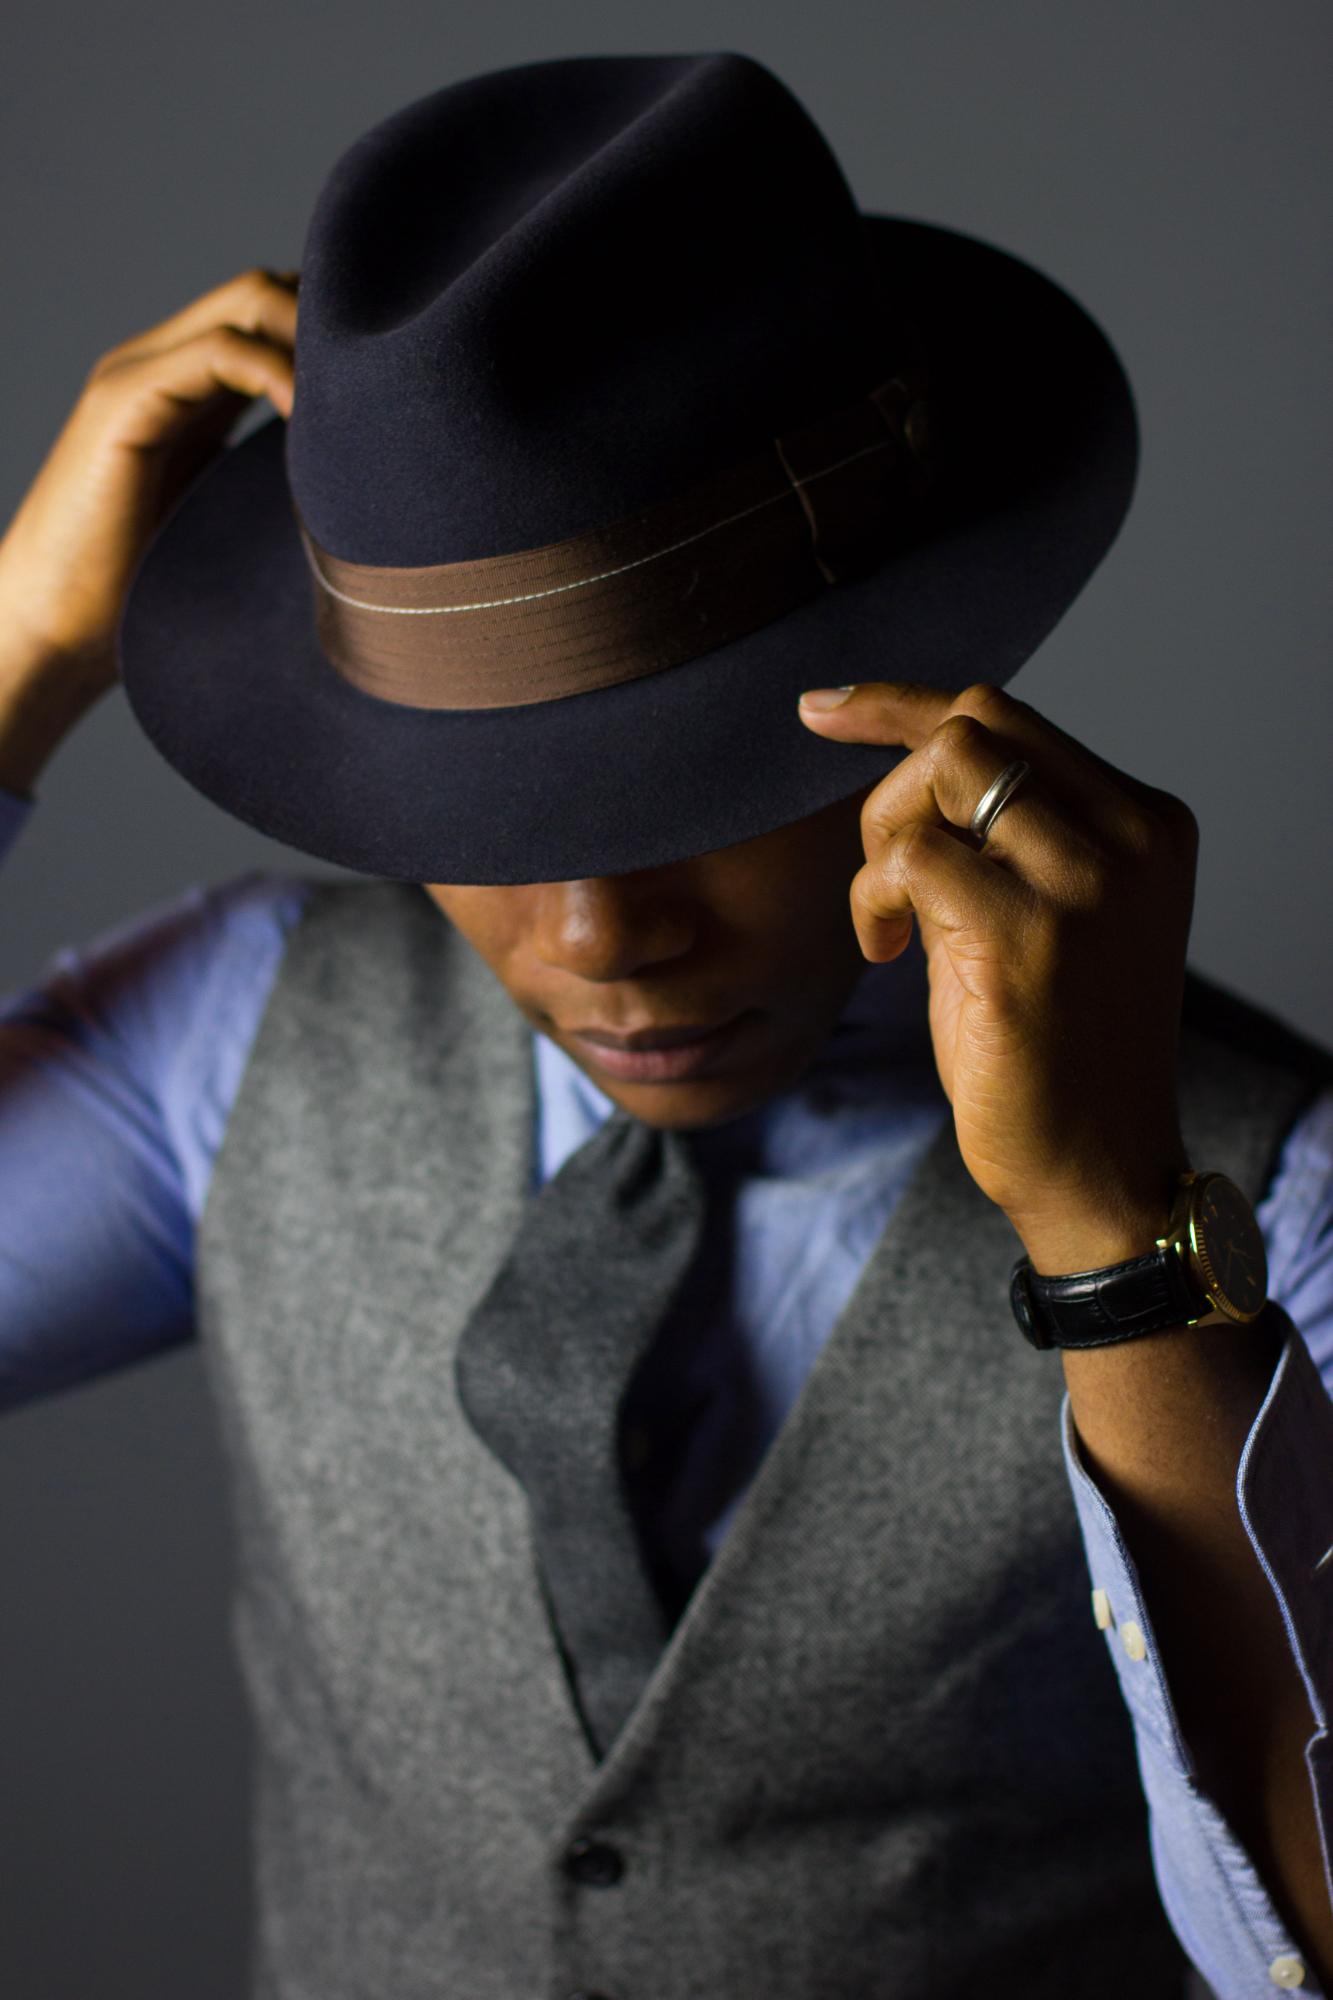 Sabir M Peele of Men's style pro in brimmed hats from goorin bros